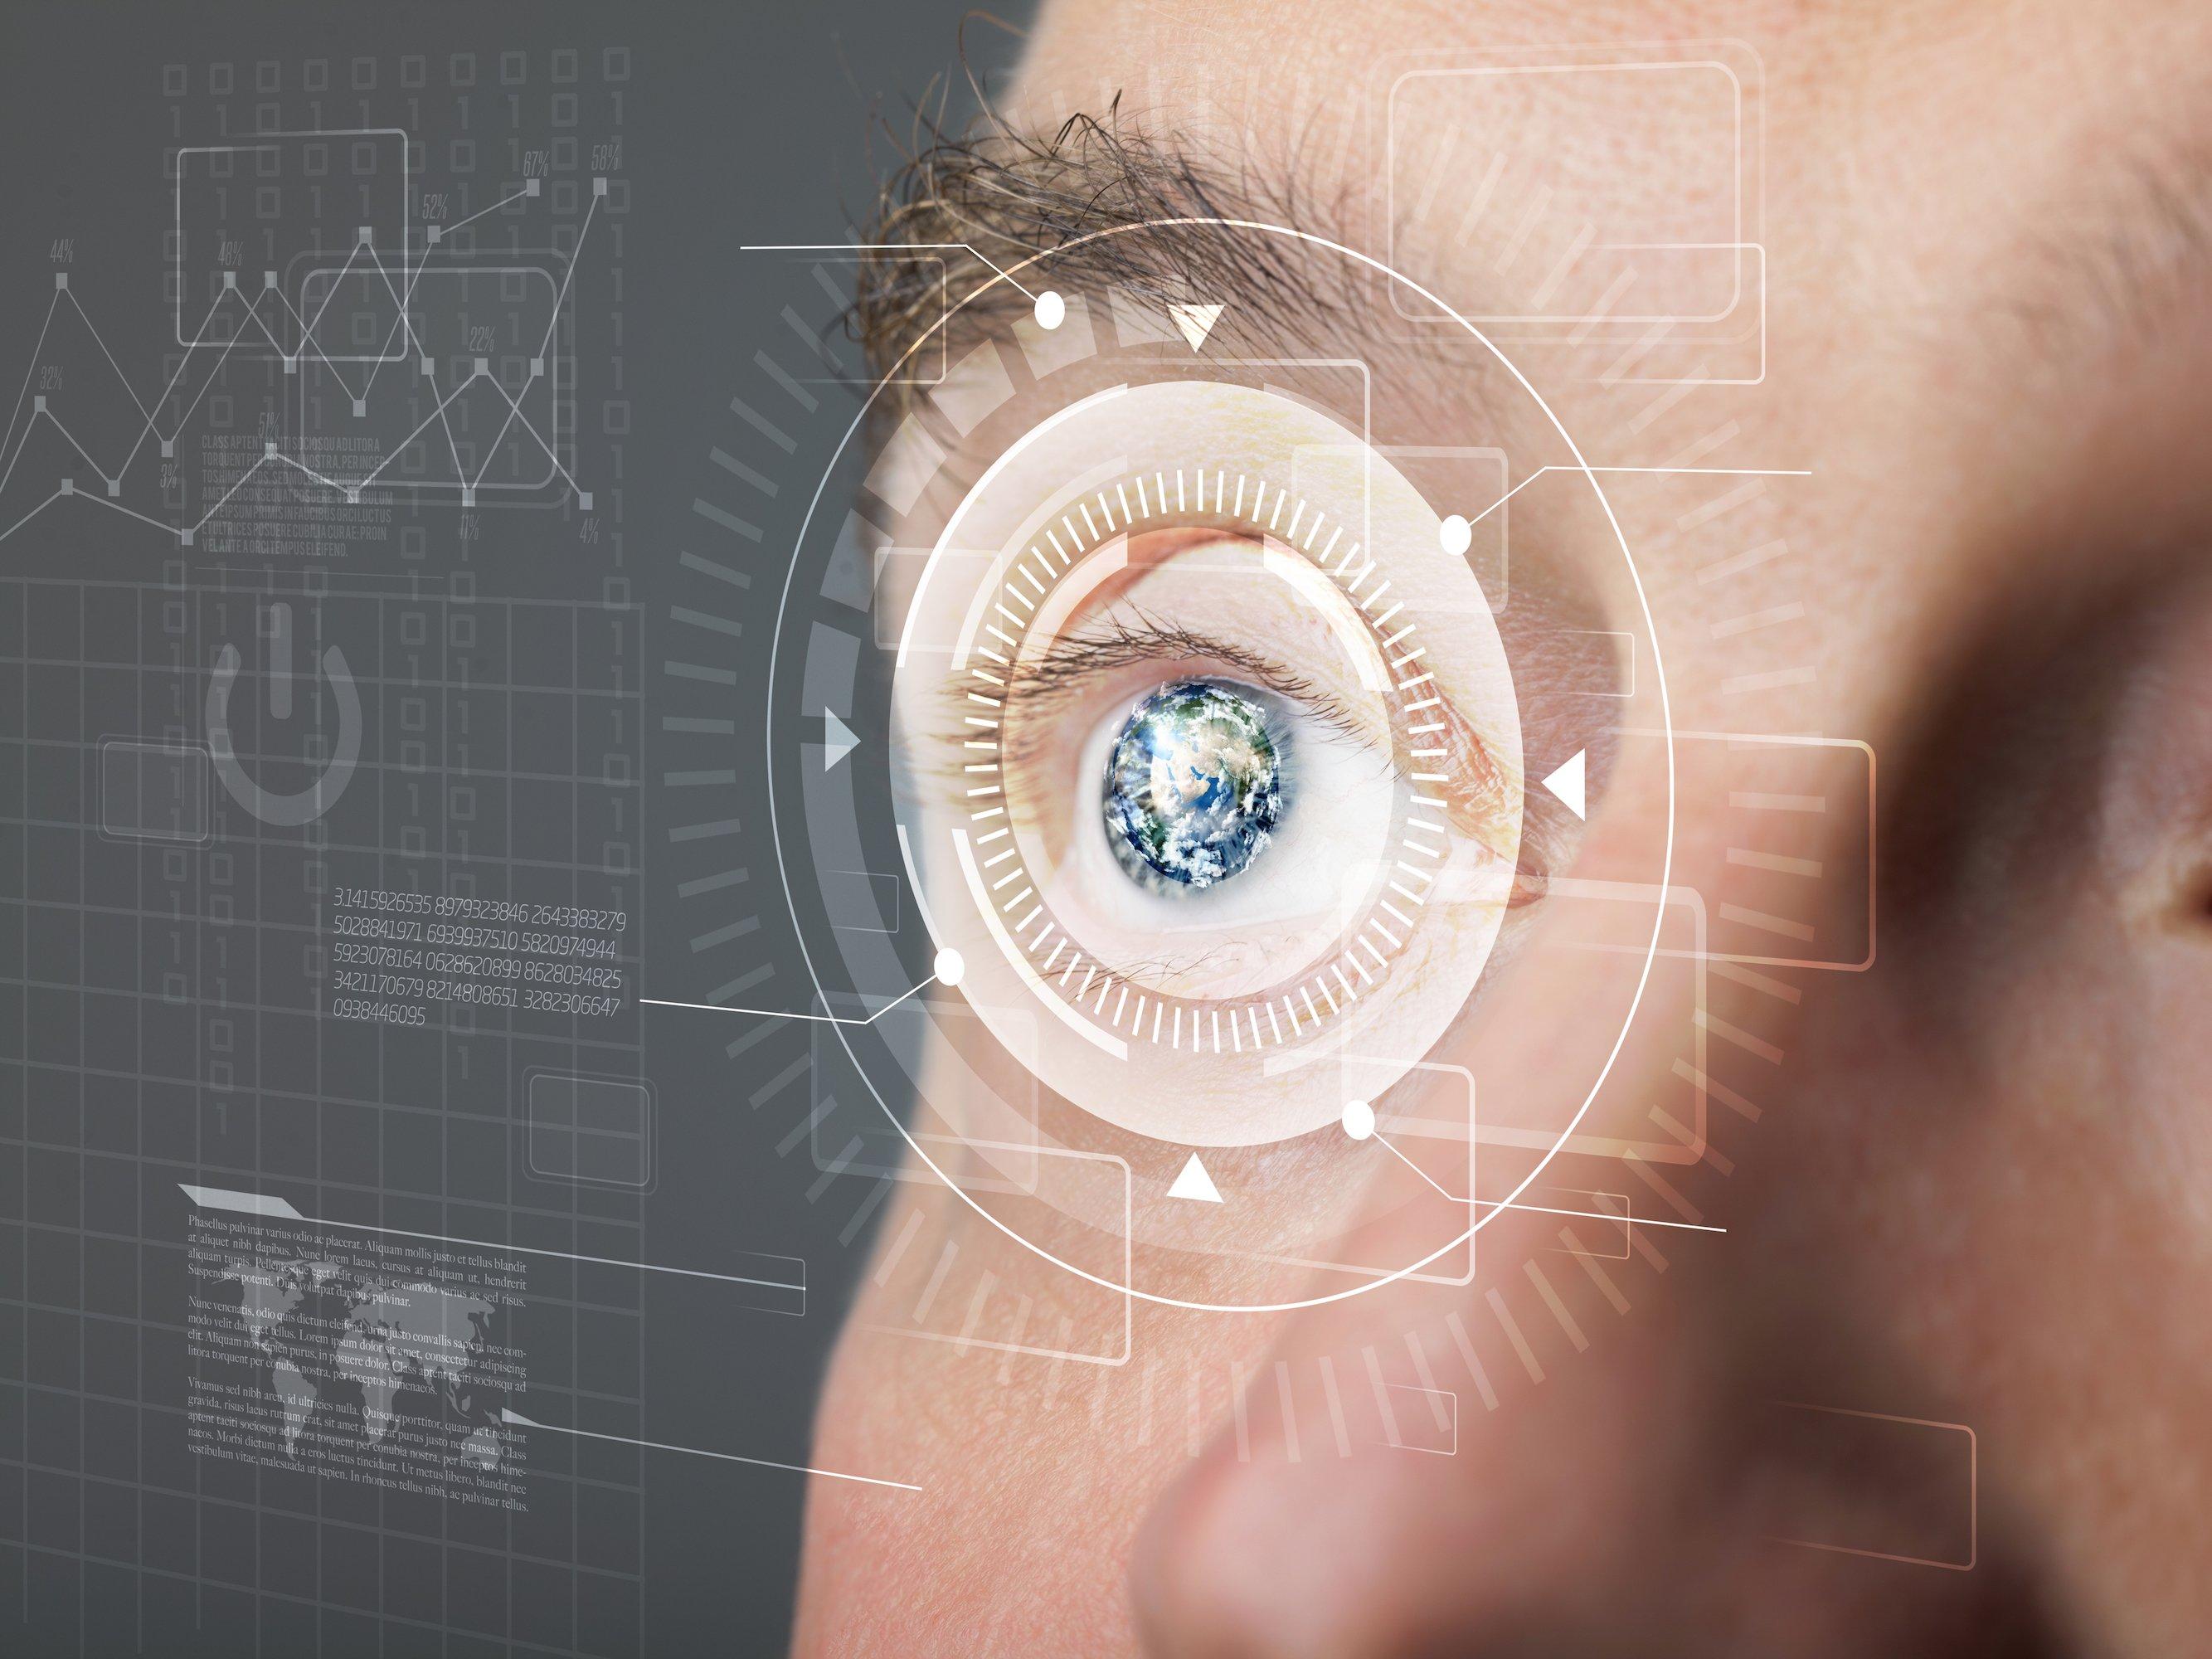 7 descobertas médicas completamente futuristas